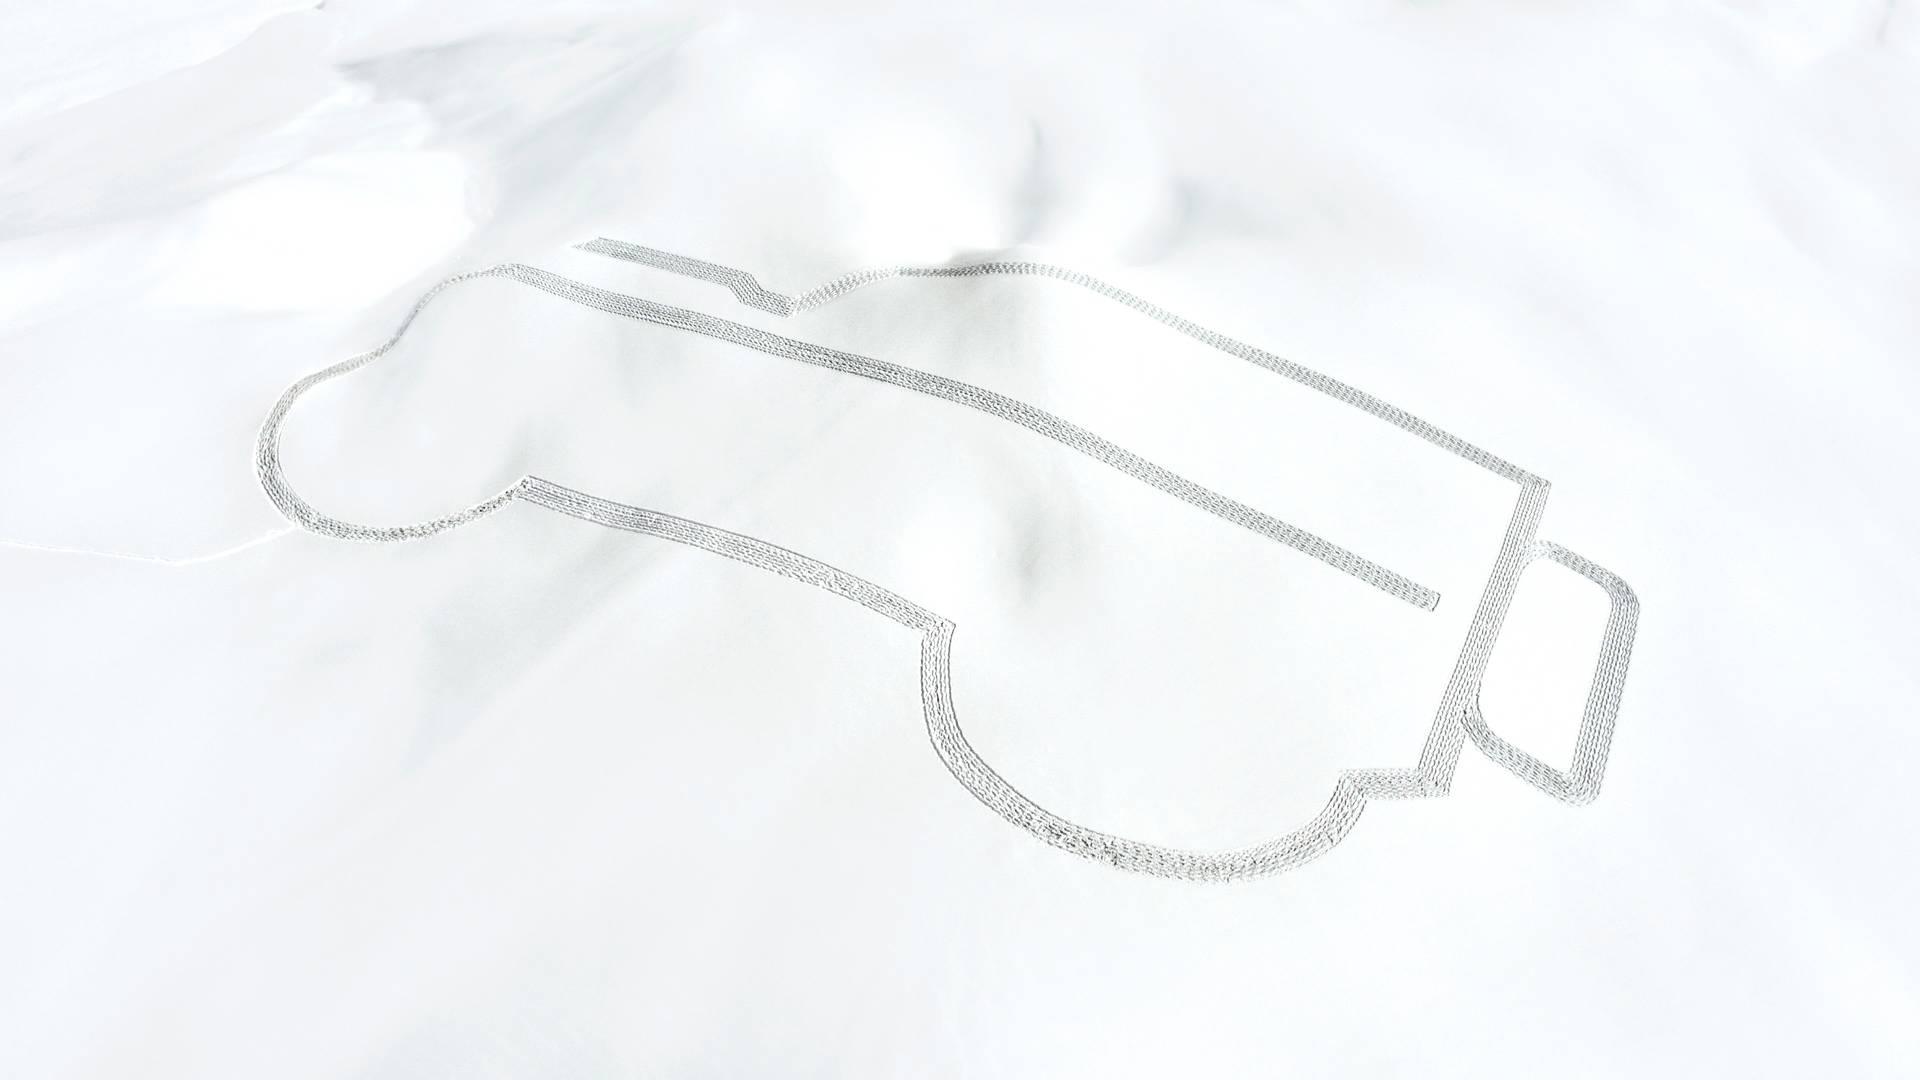 250-метровый Лэнд Ровер  Defender протоптали наснегу вАльпах